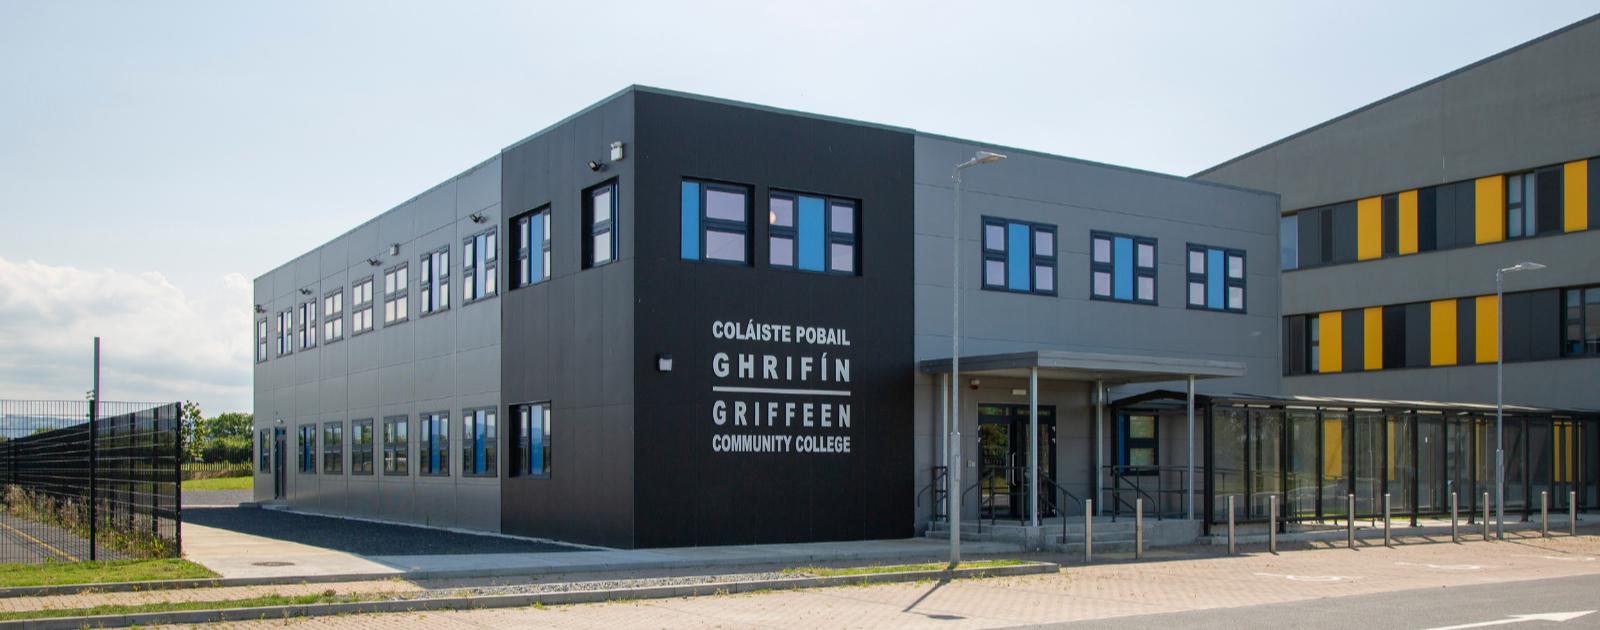 Griffeen  Community College